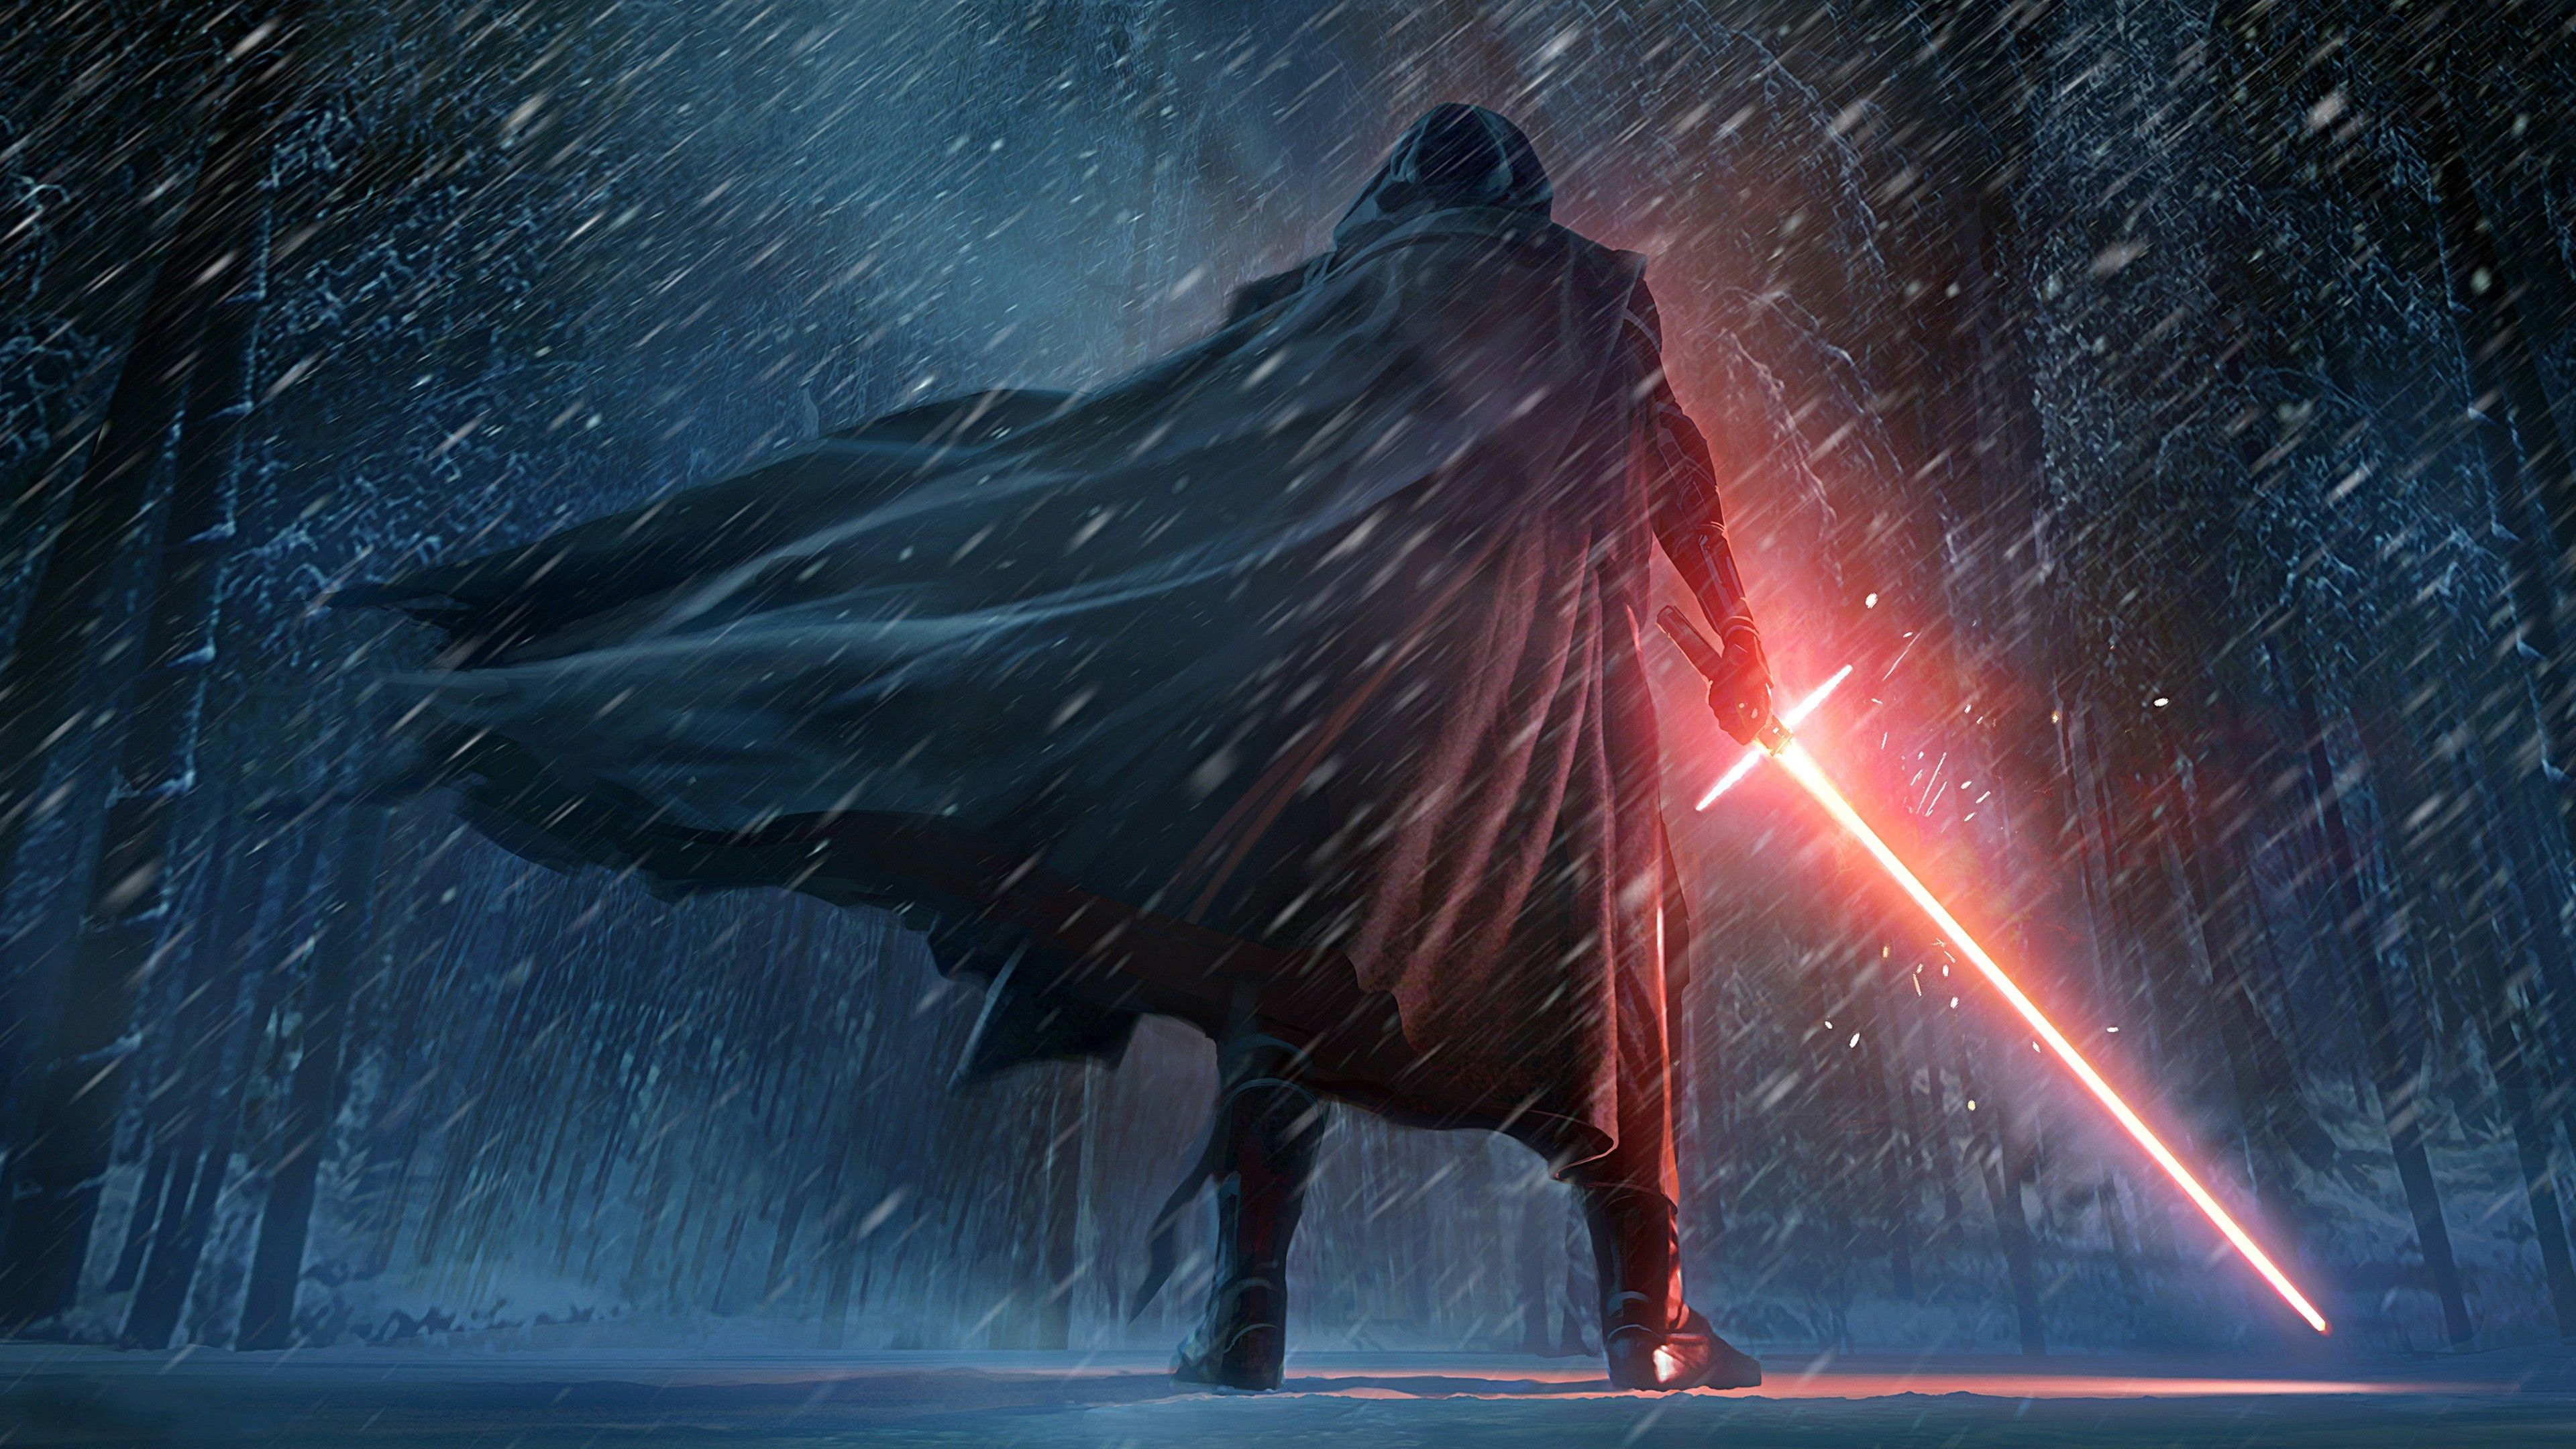 Kylo Ren Star Wars Episode 7 the Force Awaken Art 4k